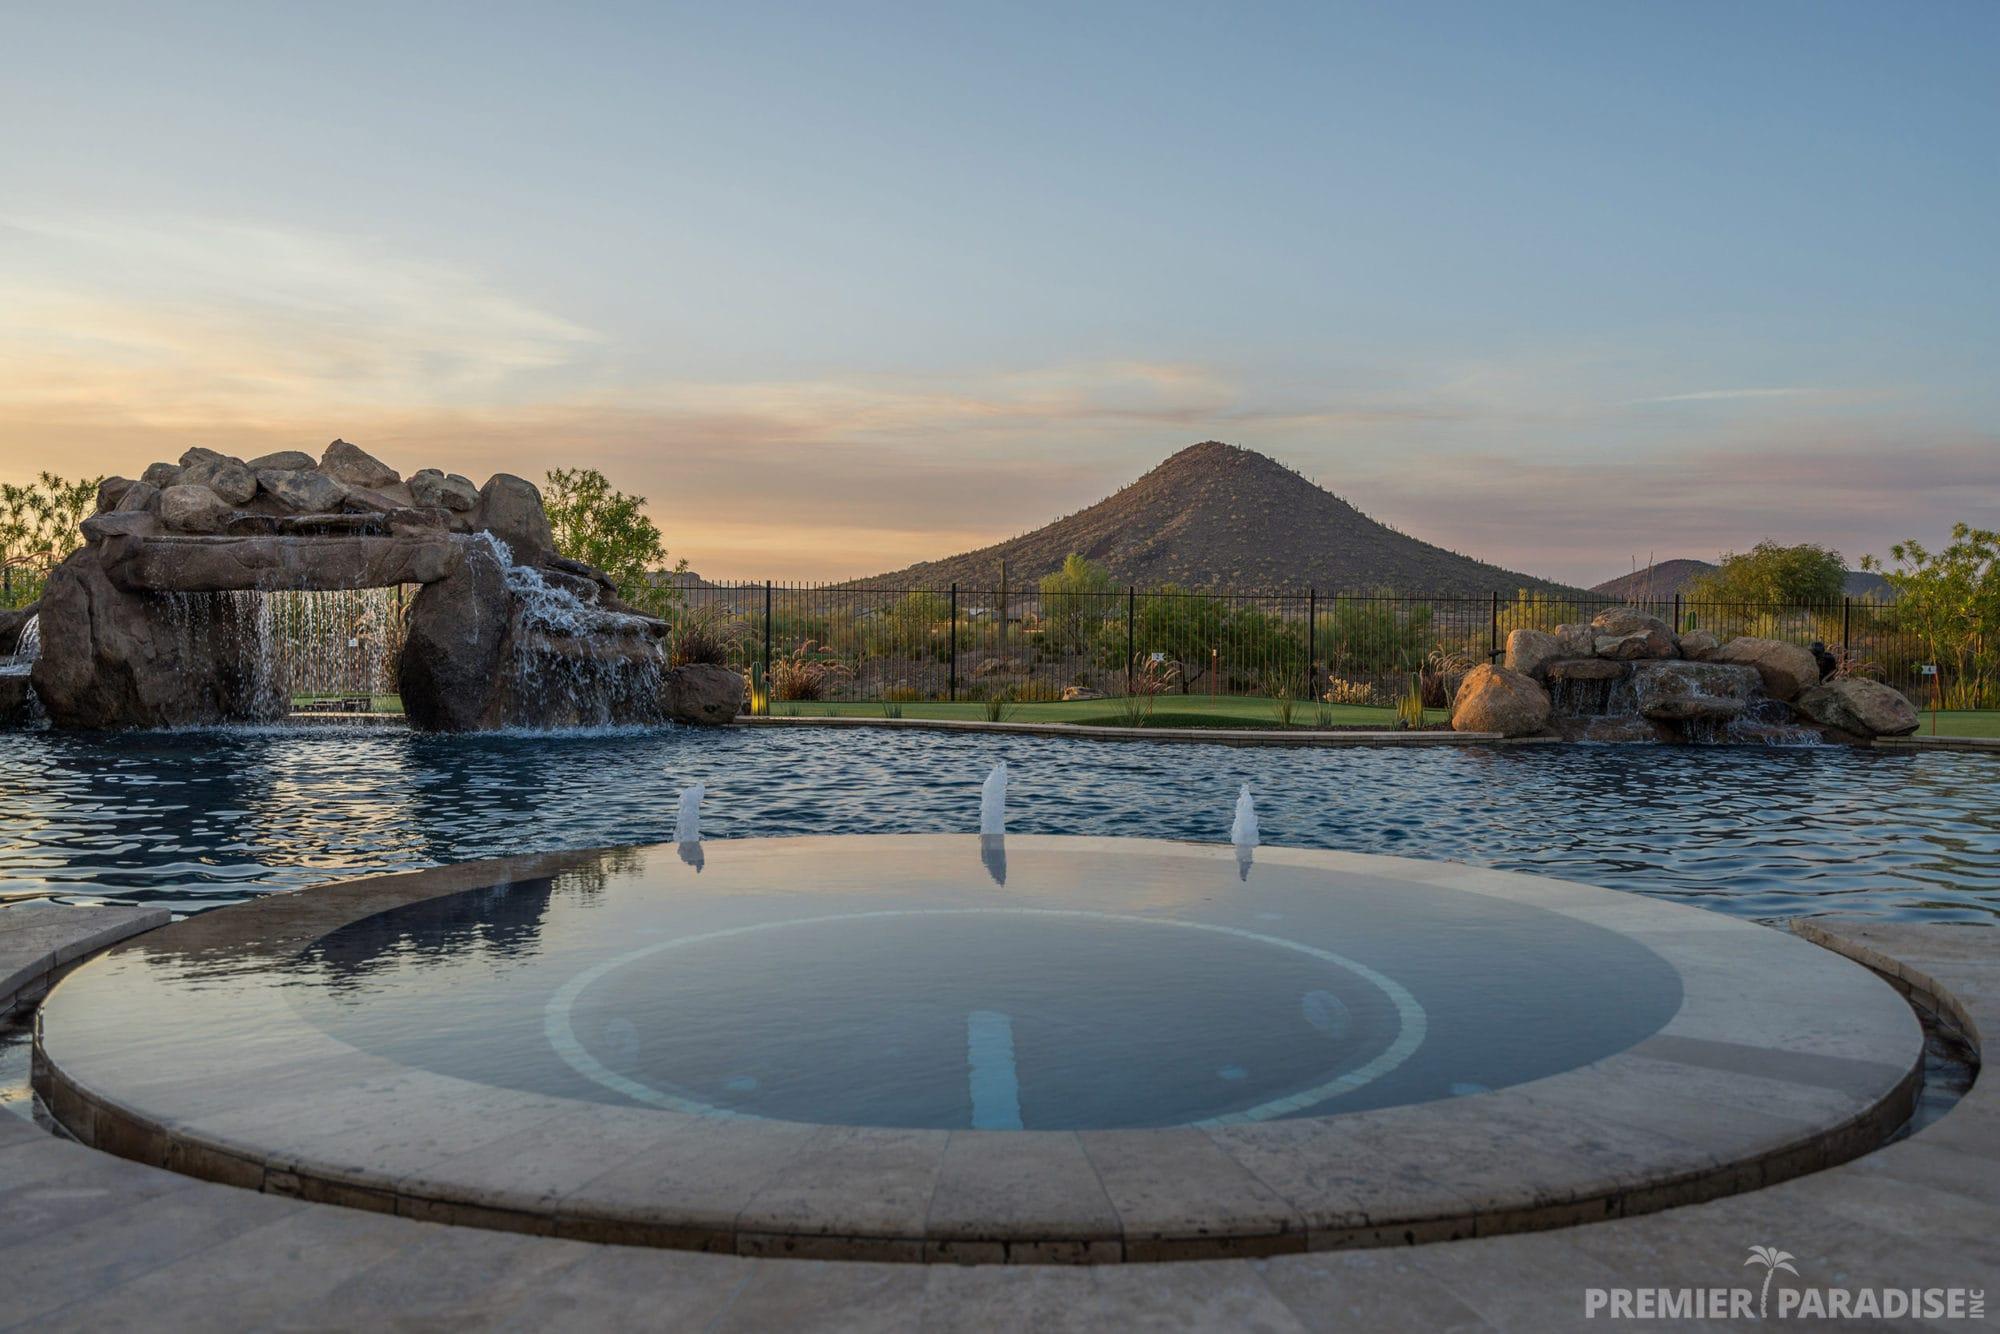 Resort Like Leisure Peoria Paradise Premier Paradise Inc